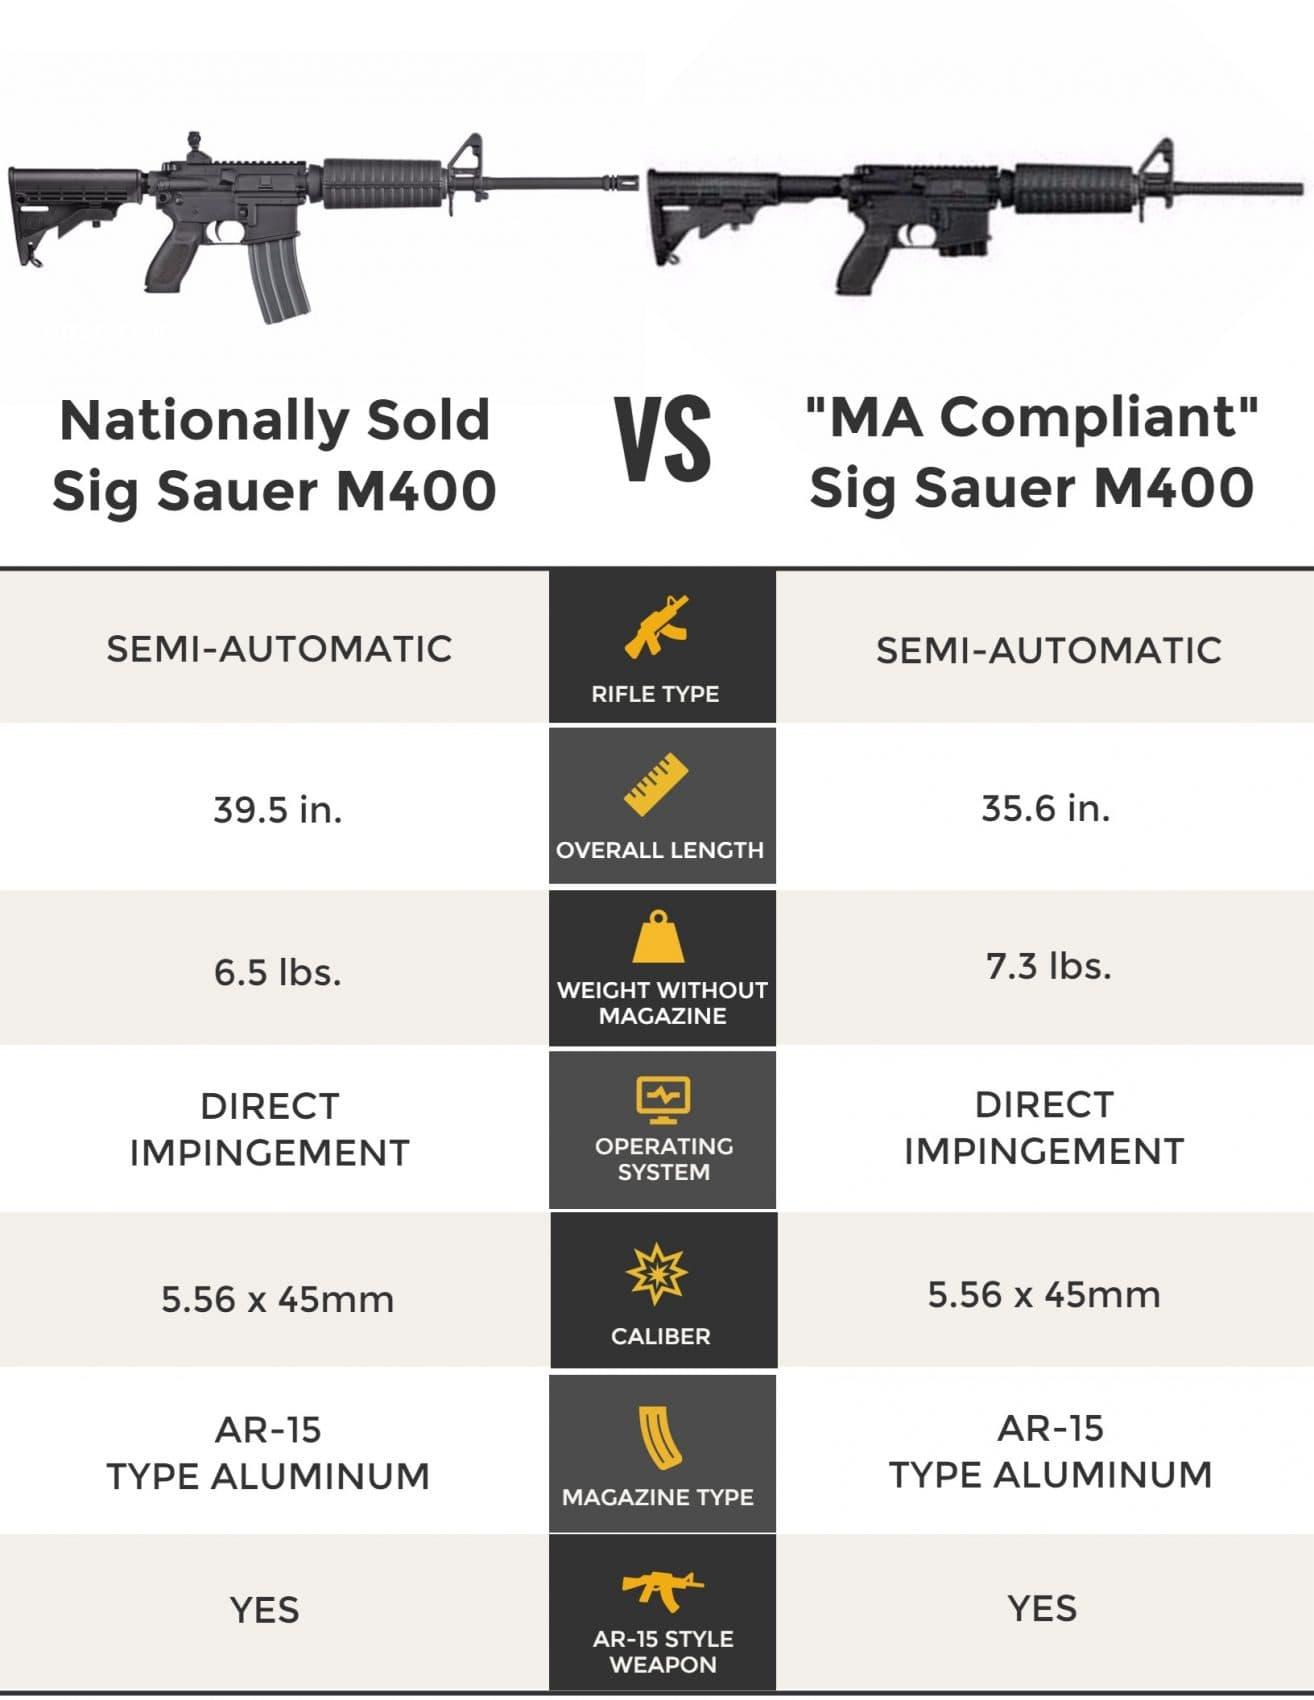 Mass Ag Healey Cracks Down On Copycat Assault Weapons